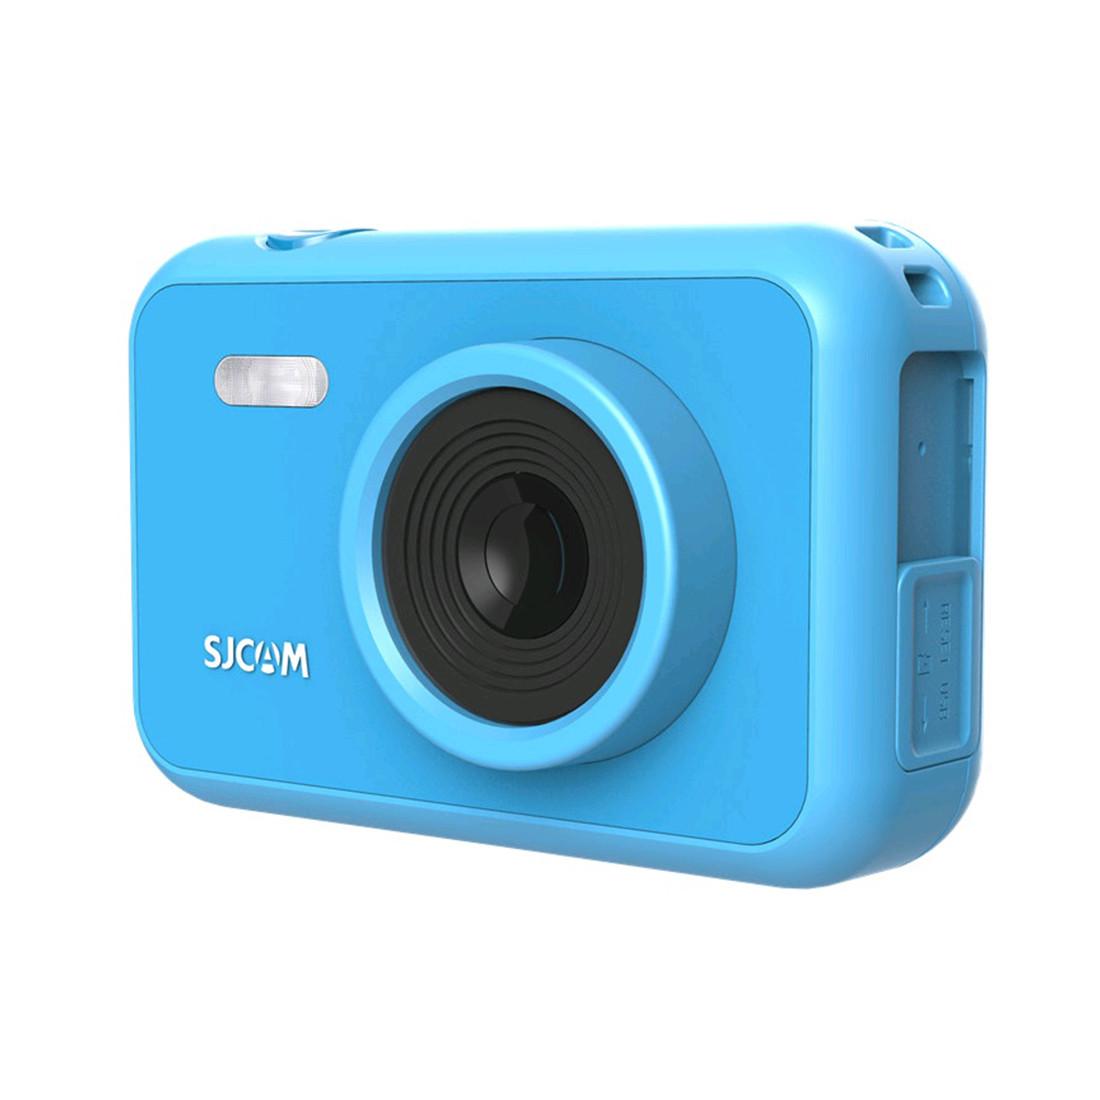 Экшн-камера, SJCAM, FunCam F1 Blue